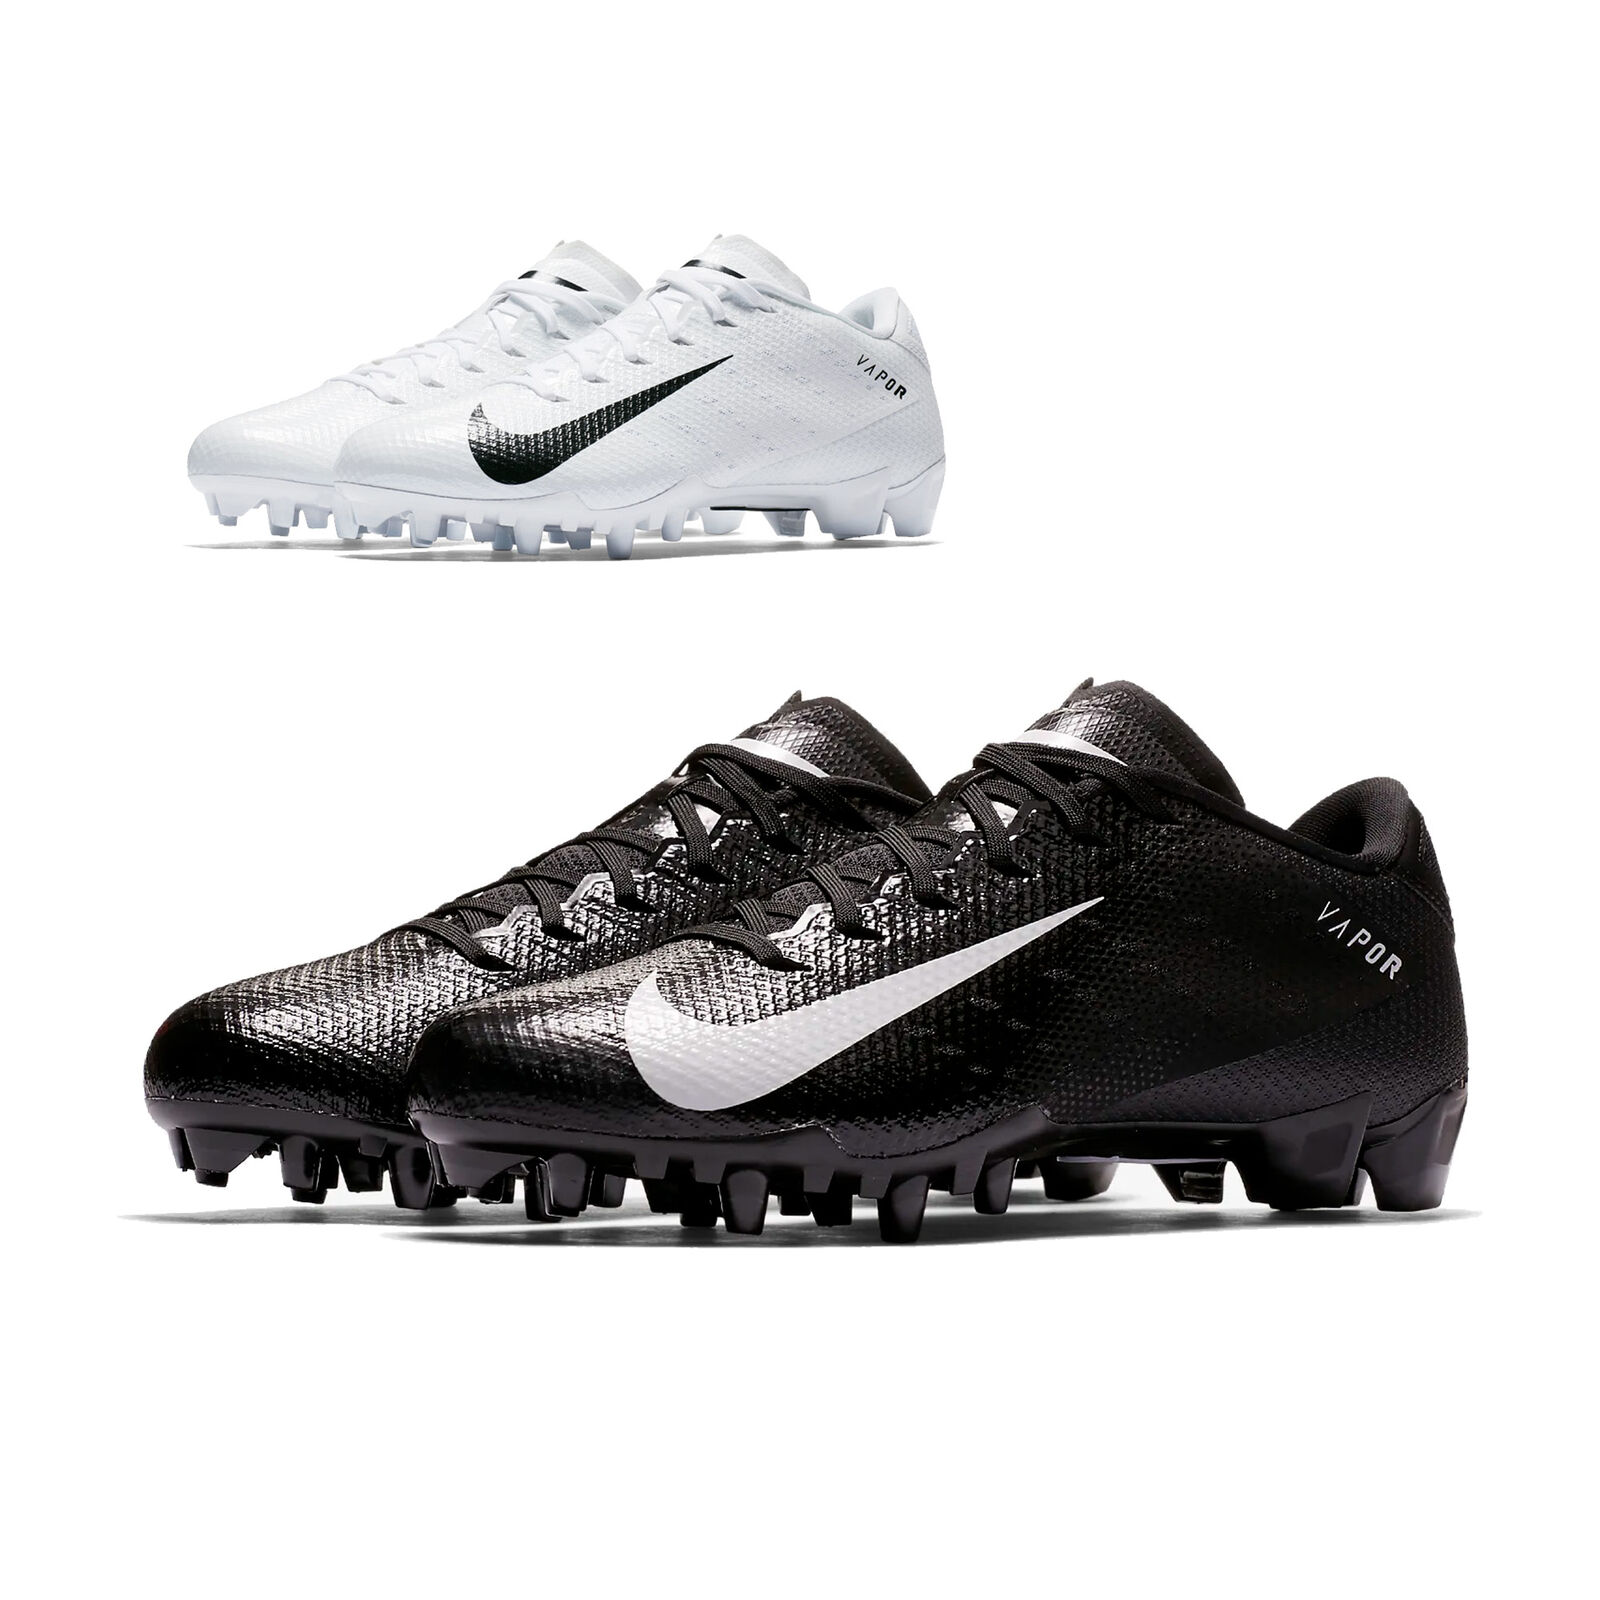 Nike Vapor Untouchable Pro 3 American Football Rasen Schuhe